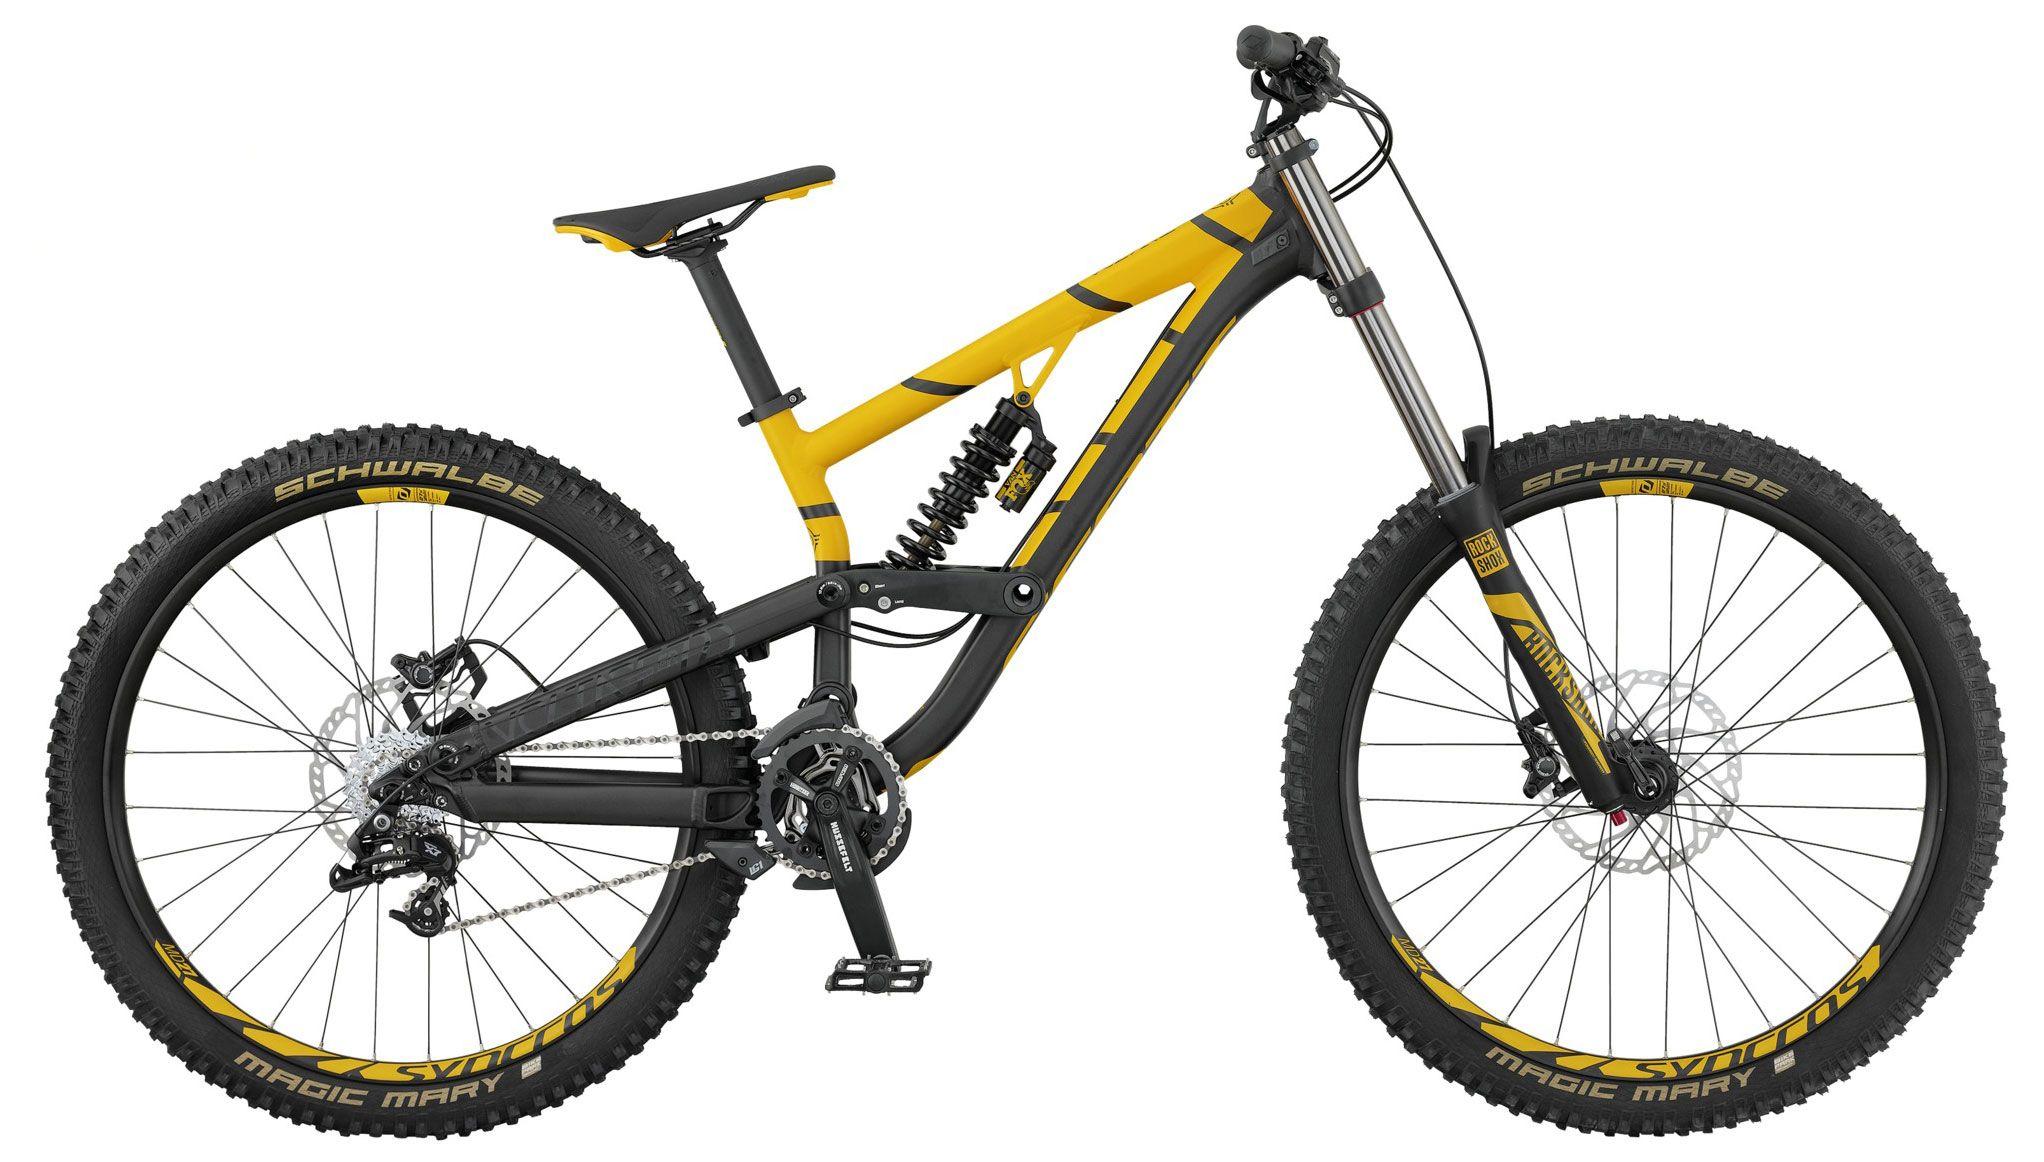 Велосипед Scott Voltage FR 720 2017,  Двухподвесы  - артикул:276440